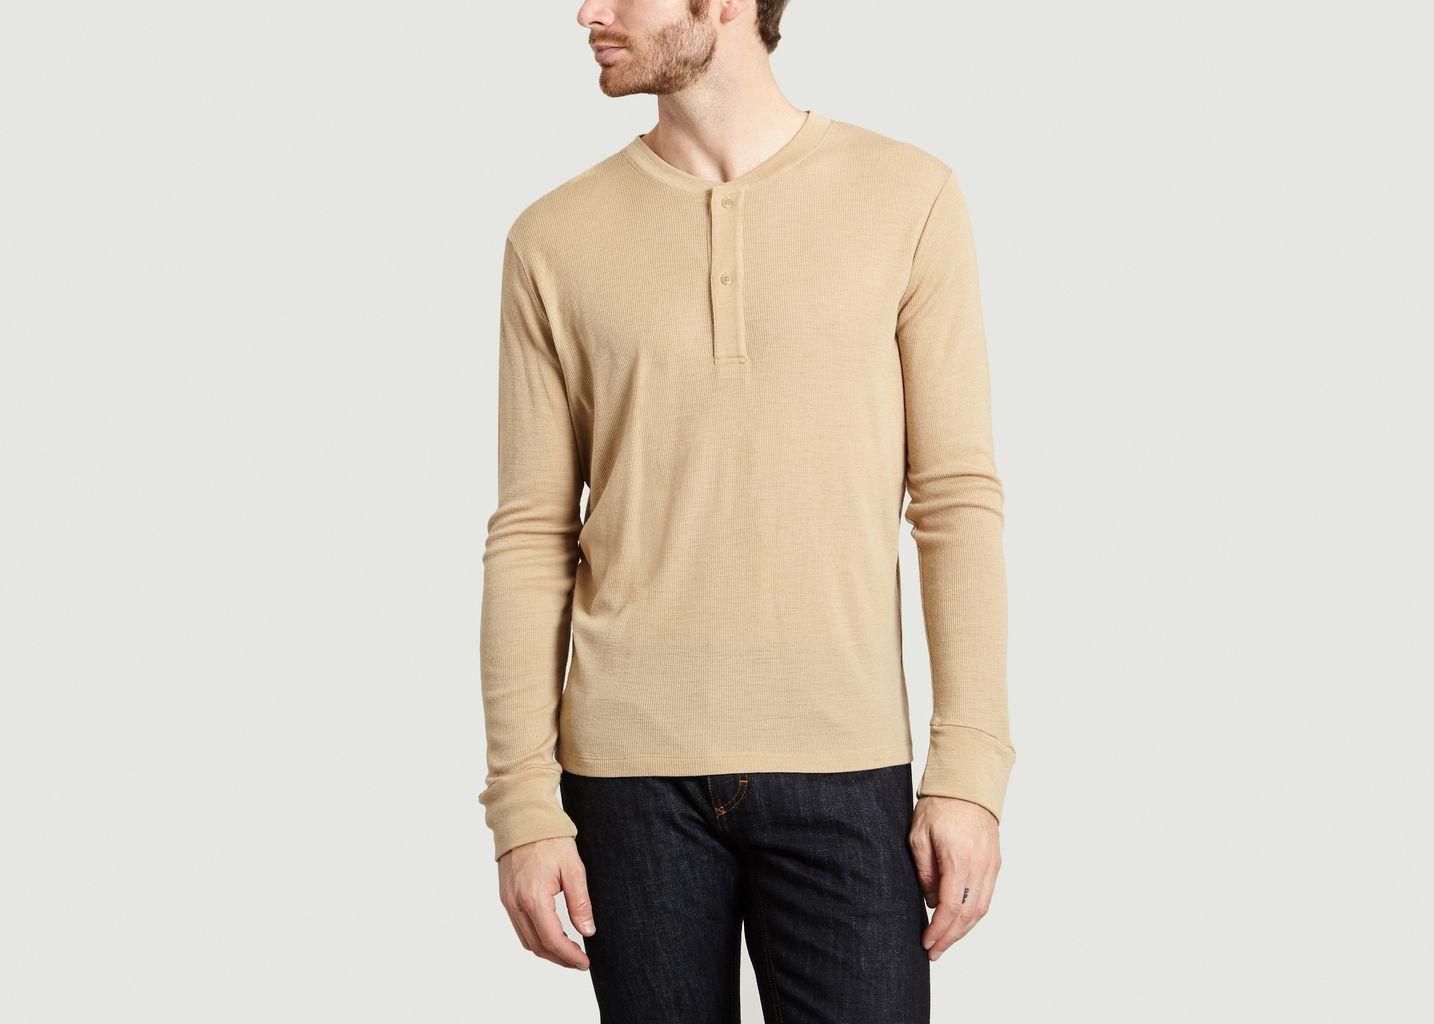 T-Shirt Henley Dyck - The White Briefs